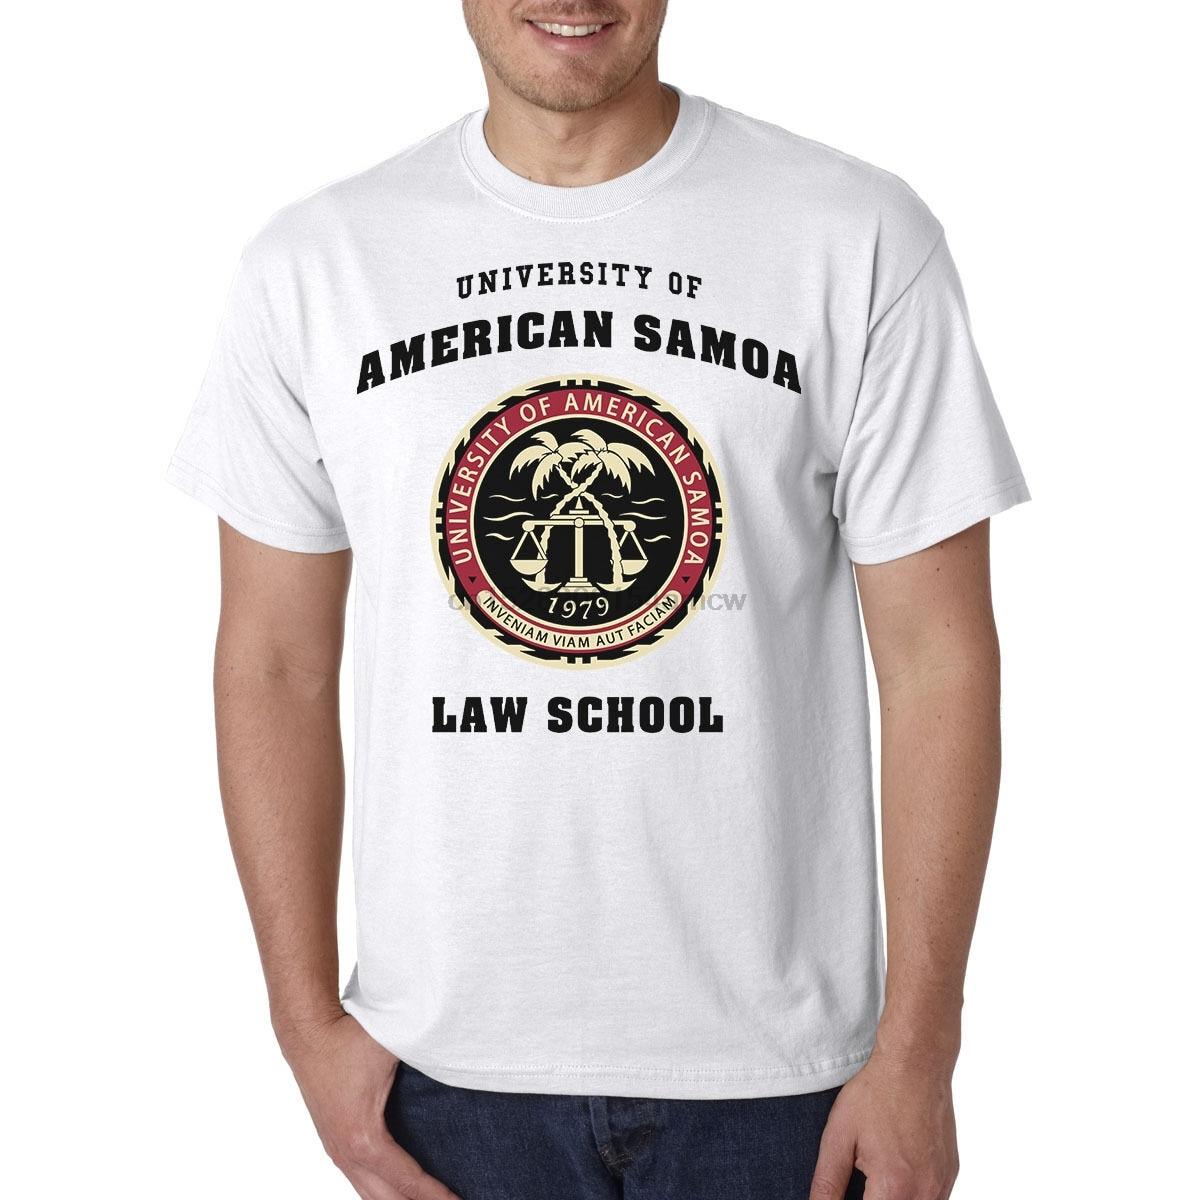 Camiseta de Escuela de Derecho de la Universidad de Samoa Americana-Heisenberg Saul Goodman